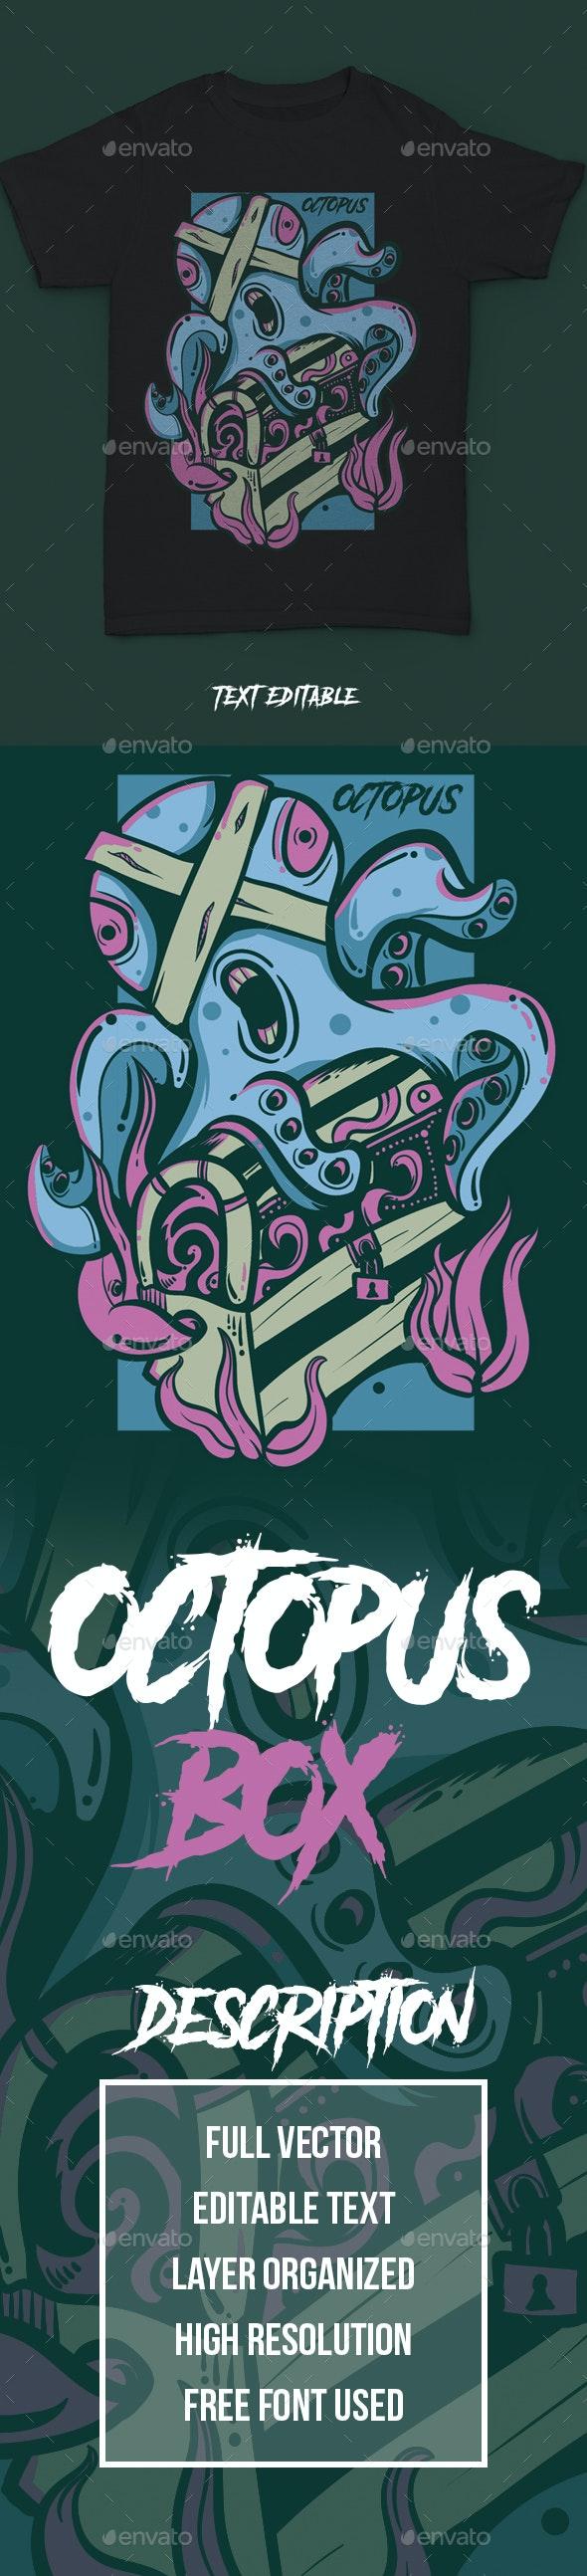 Octopus Treasure Tees V1 - Grunge Designs